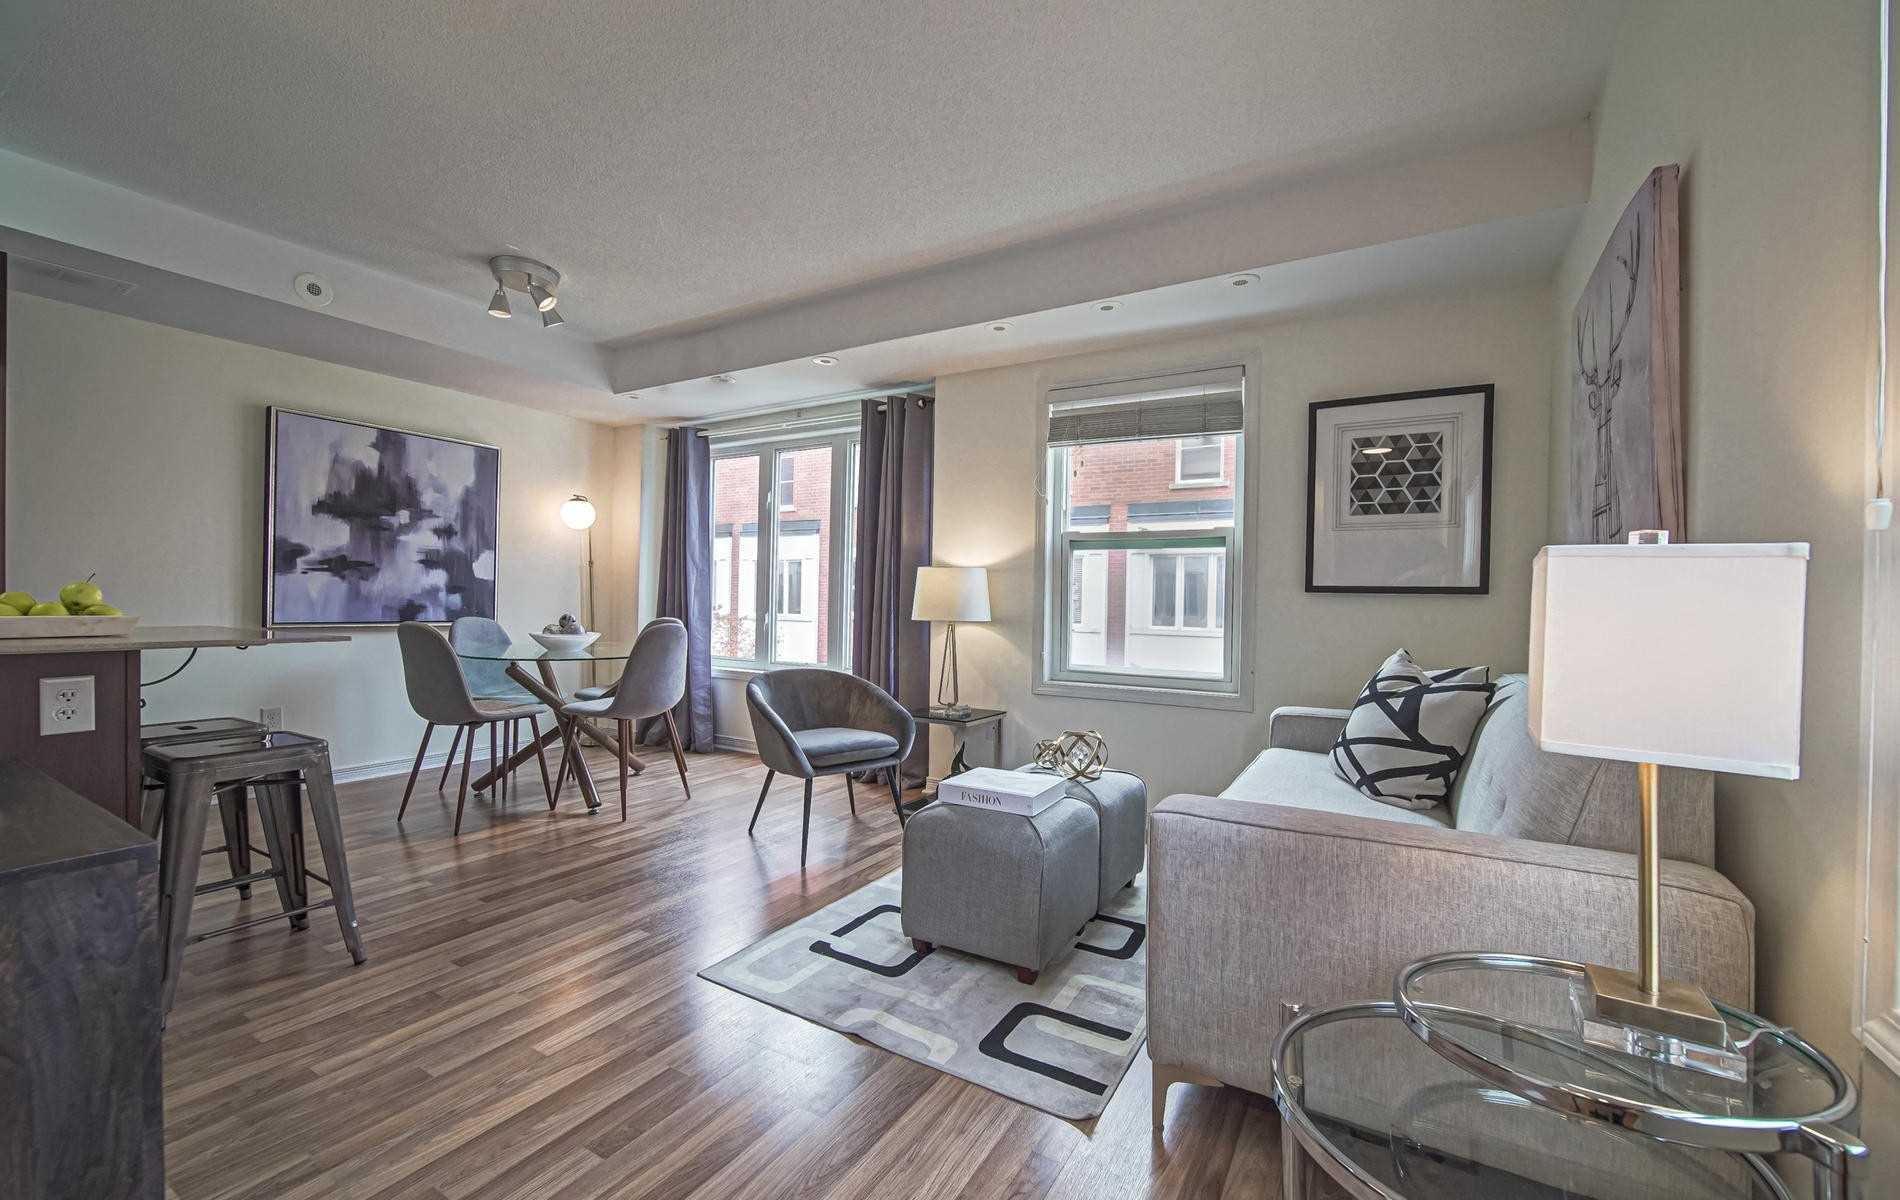 Photo 2: Photos: 3 78 Munro Street in Toronto: South Riverdale Condo for sale (Toronto E01)  : MLS®# E4615987